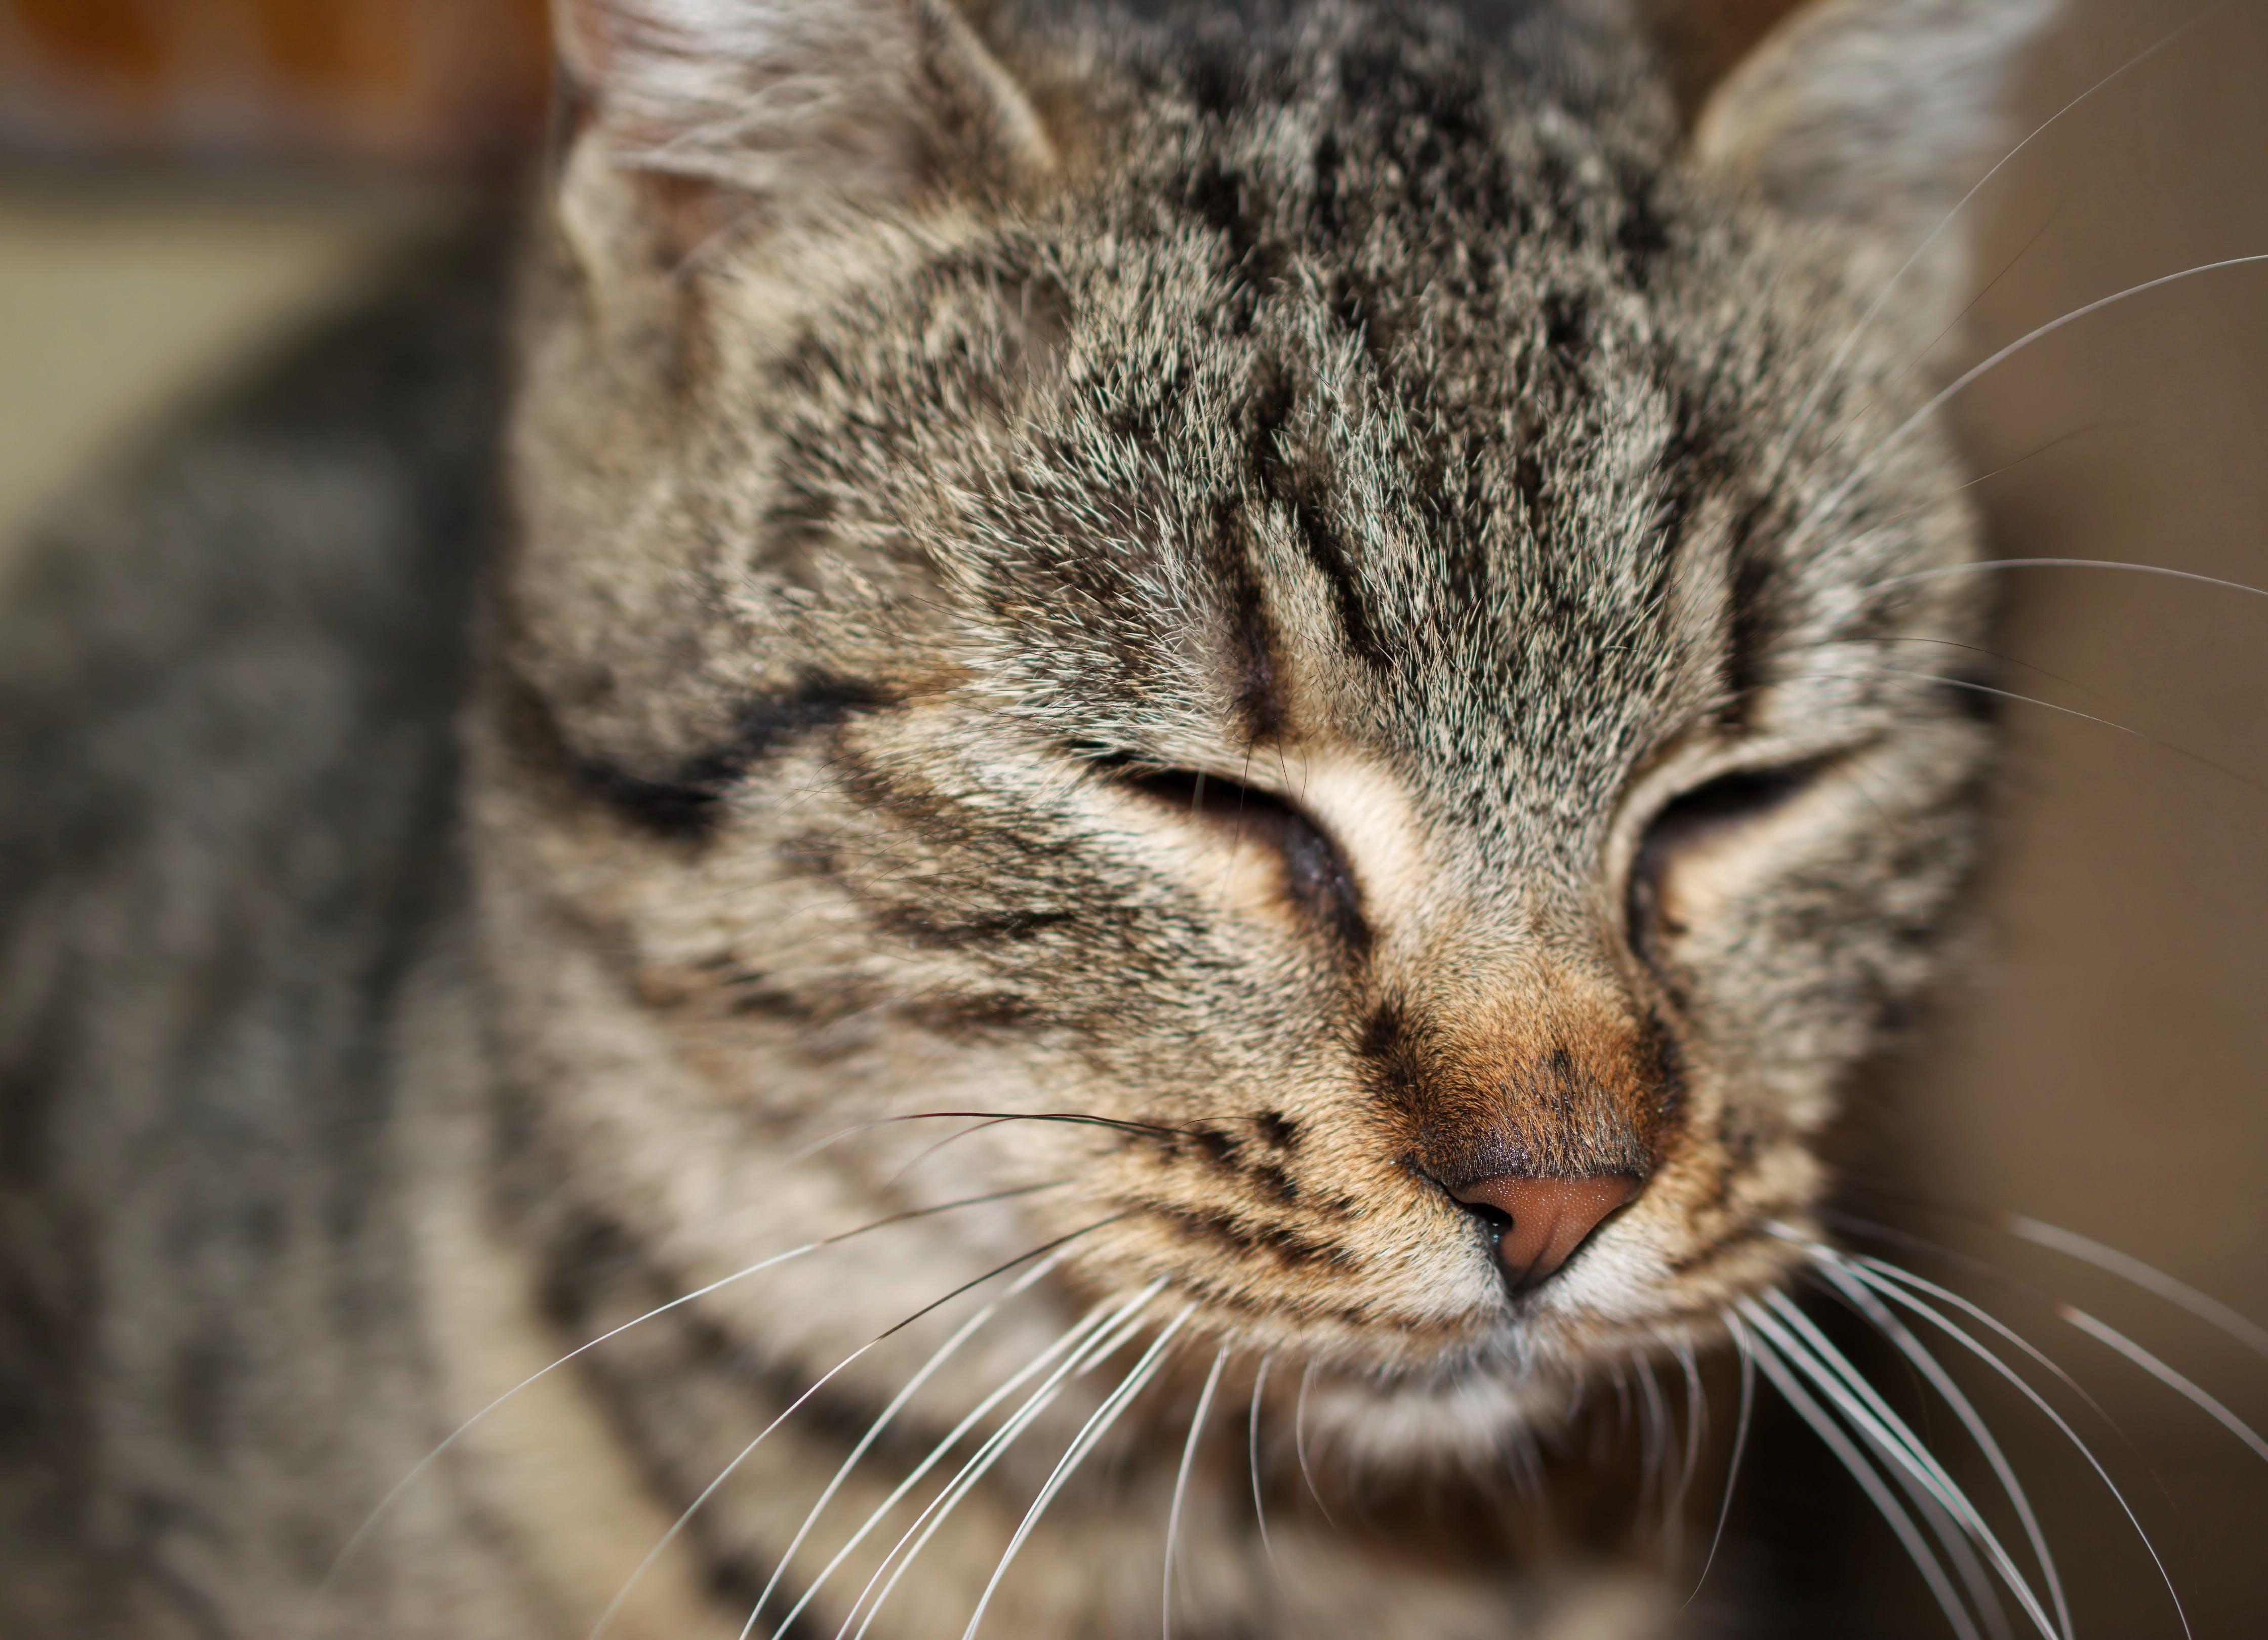 Free stock photo of animal, close-up, closed eyes, cute